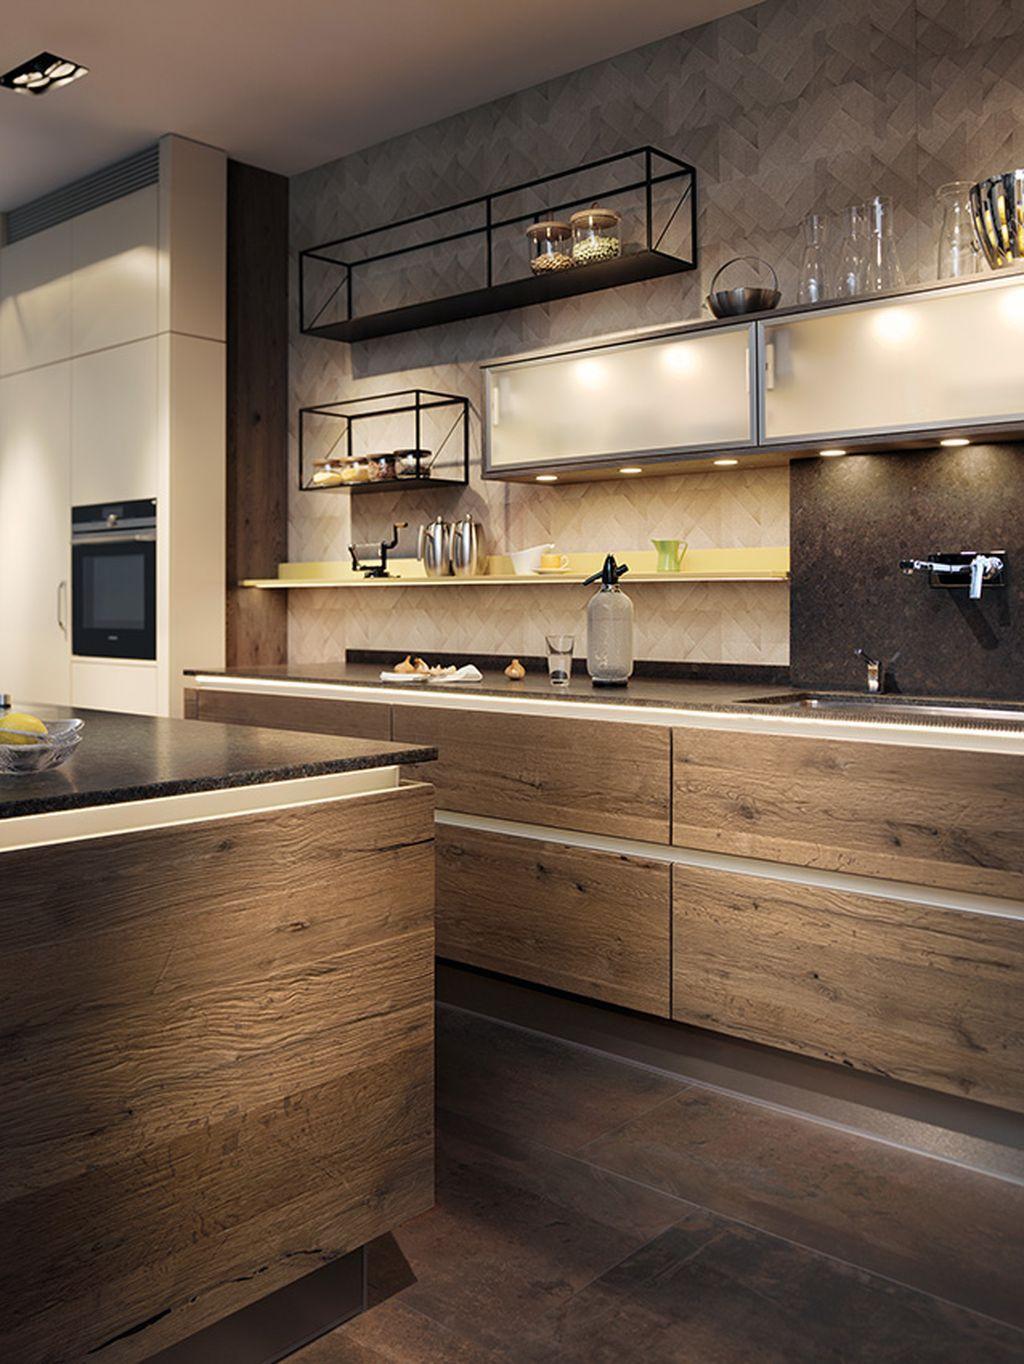 Pin By Homekemiri On Kitchen Ideas In 2019 Industrial Kitchen